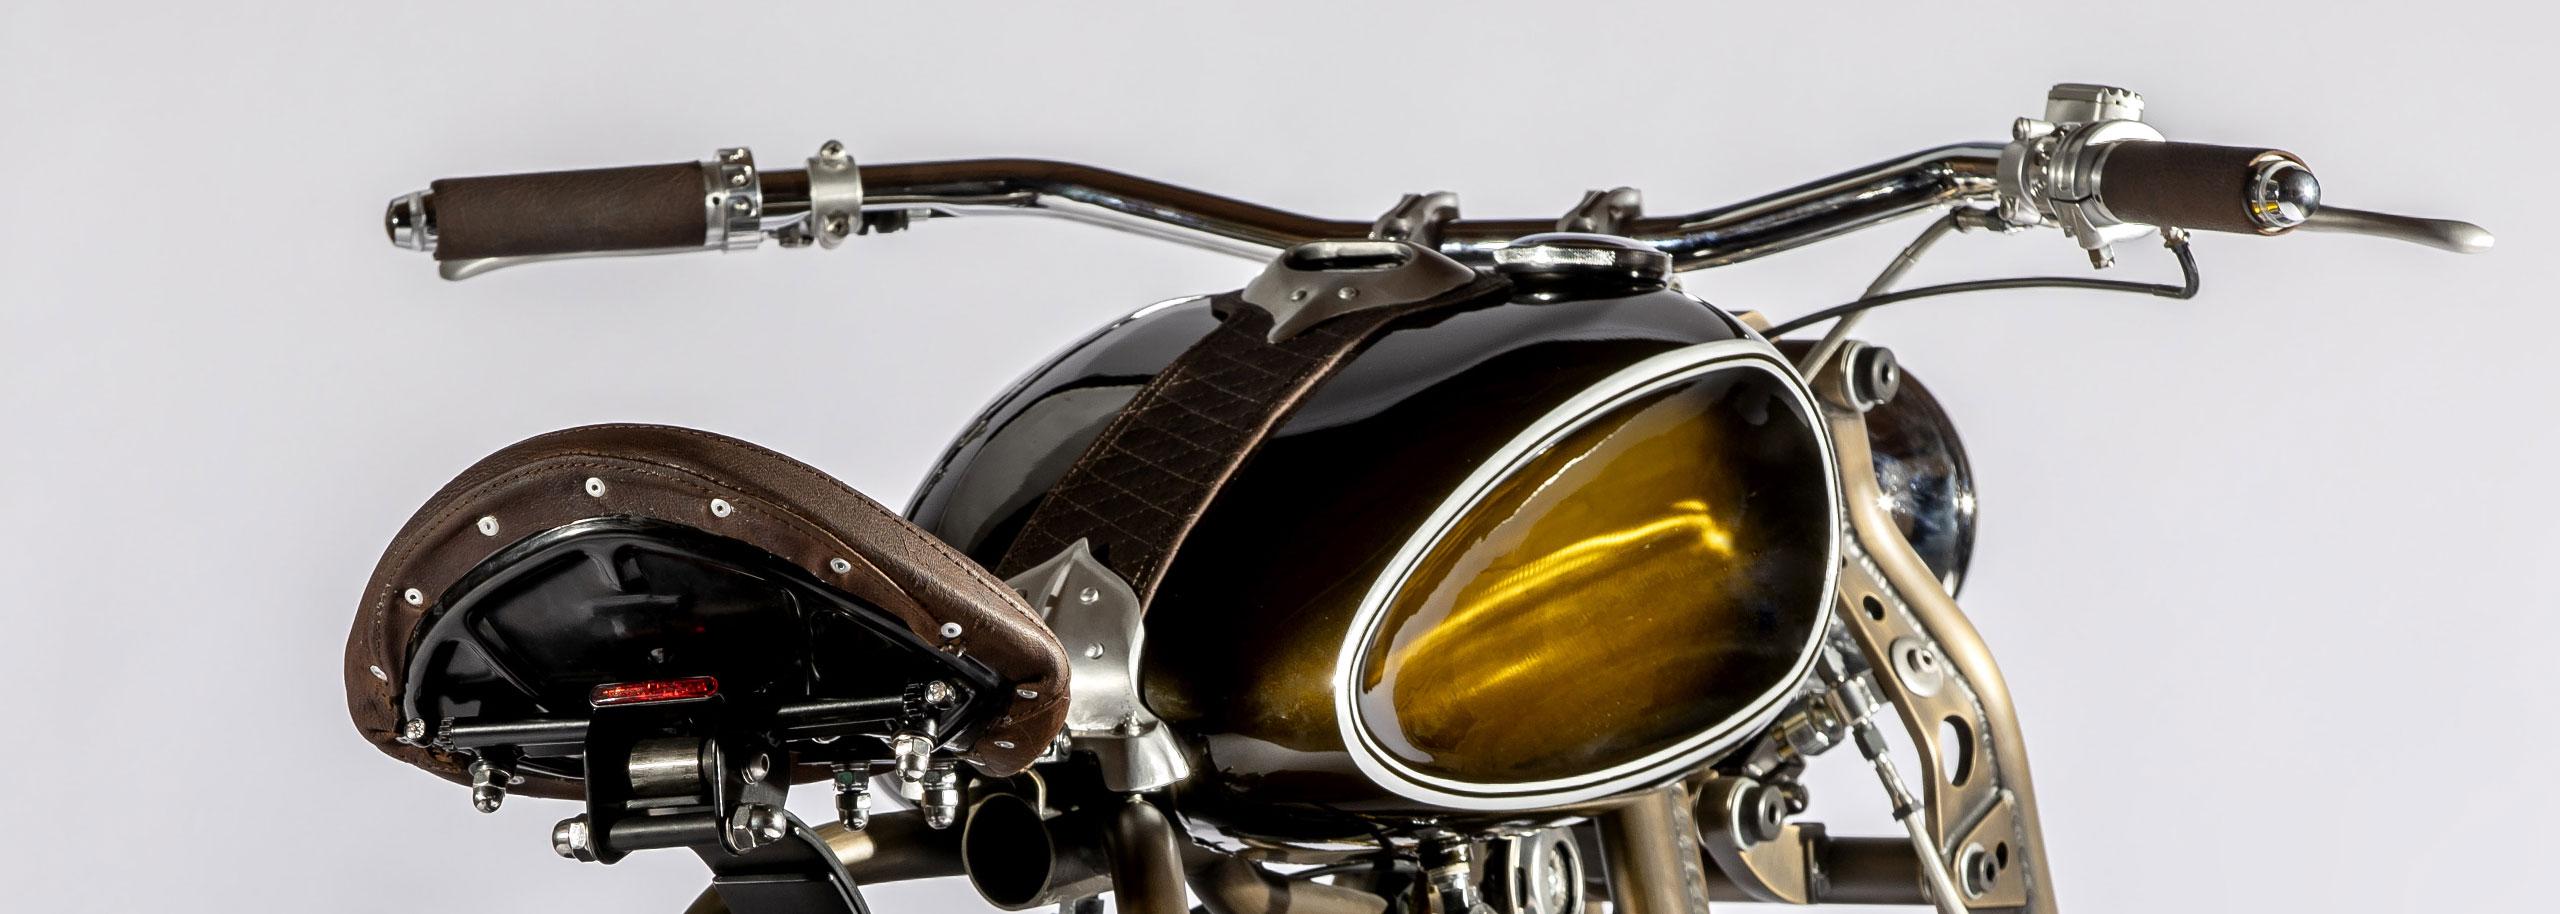 TITAN Arkitekt Cafe Racer Graz BMW Motorrad Design Monaco Yacht Show Car Deck Racing Motorcycle Monte Carlo